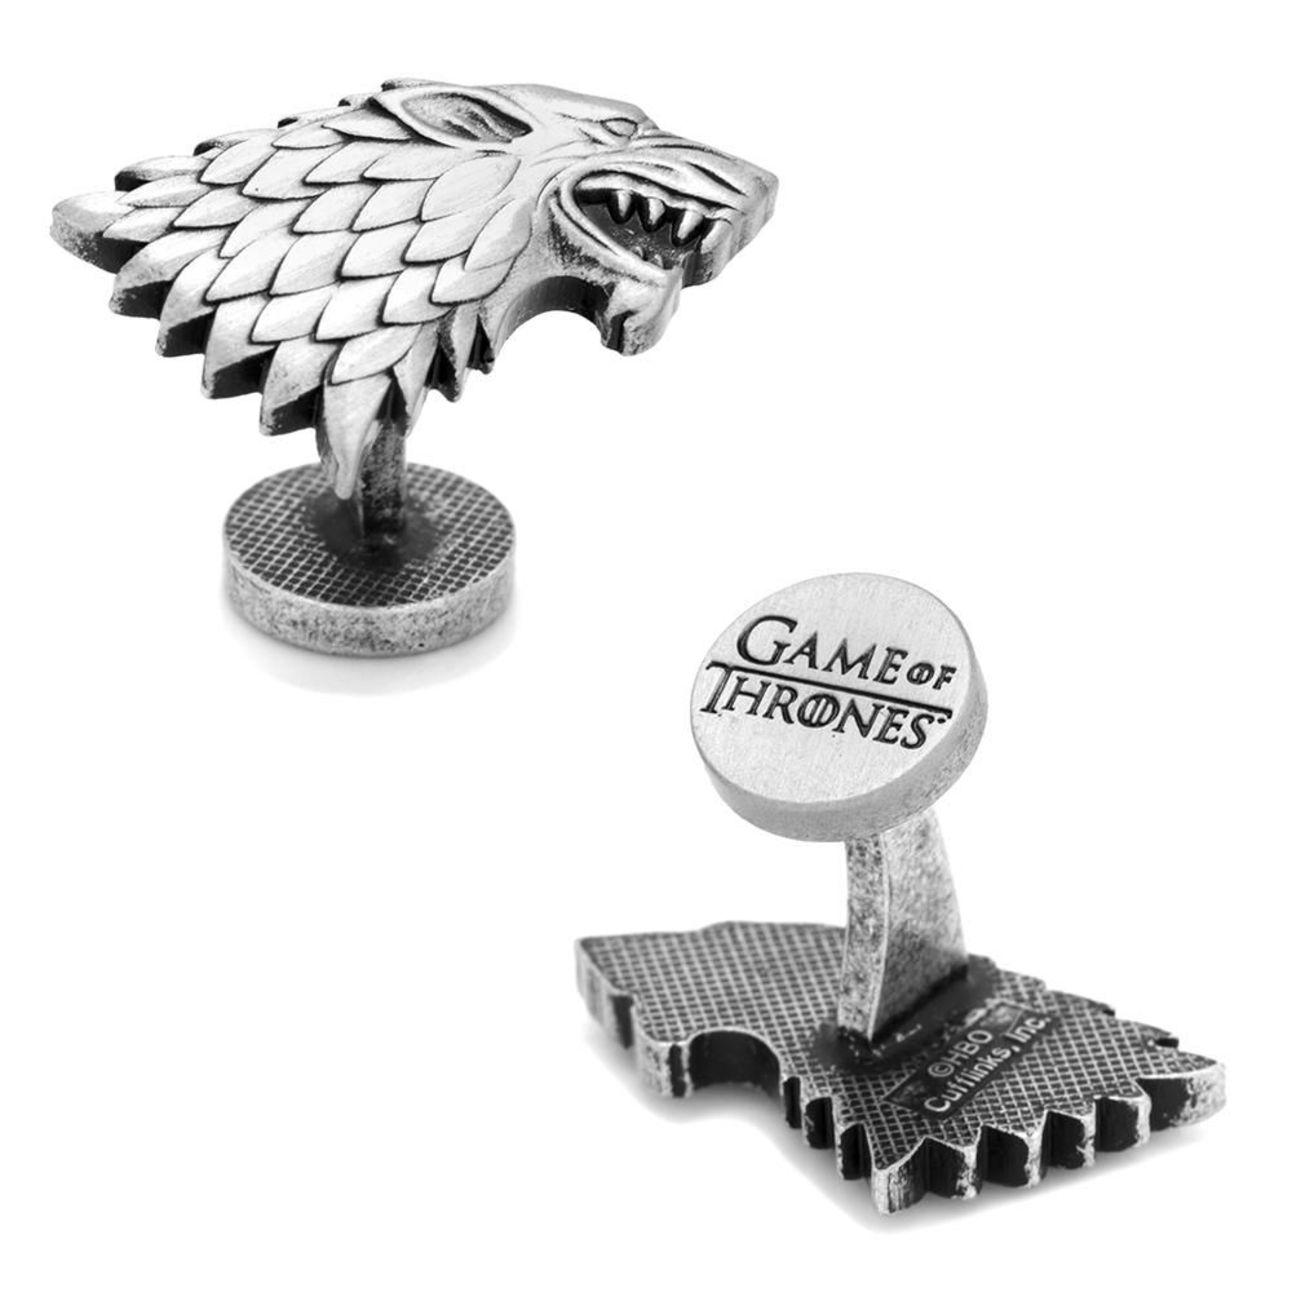 Game of Thrones Cufflinks